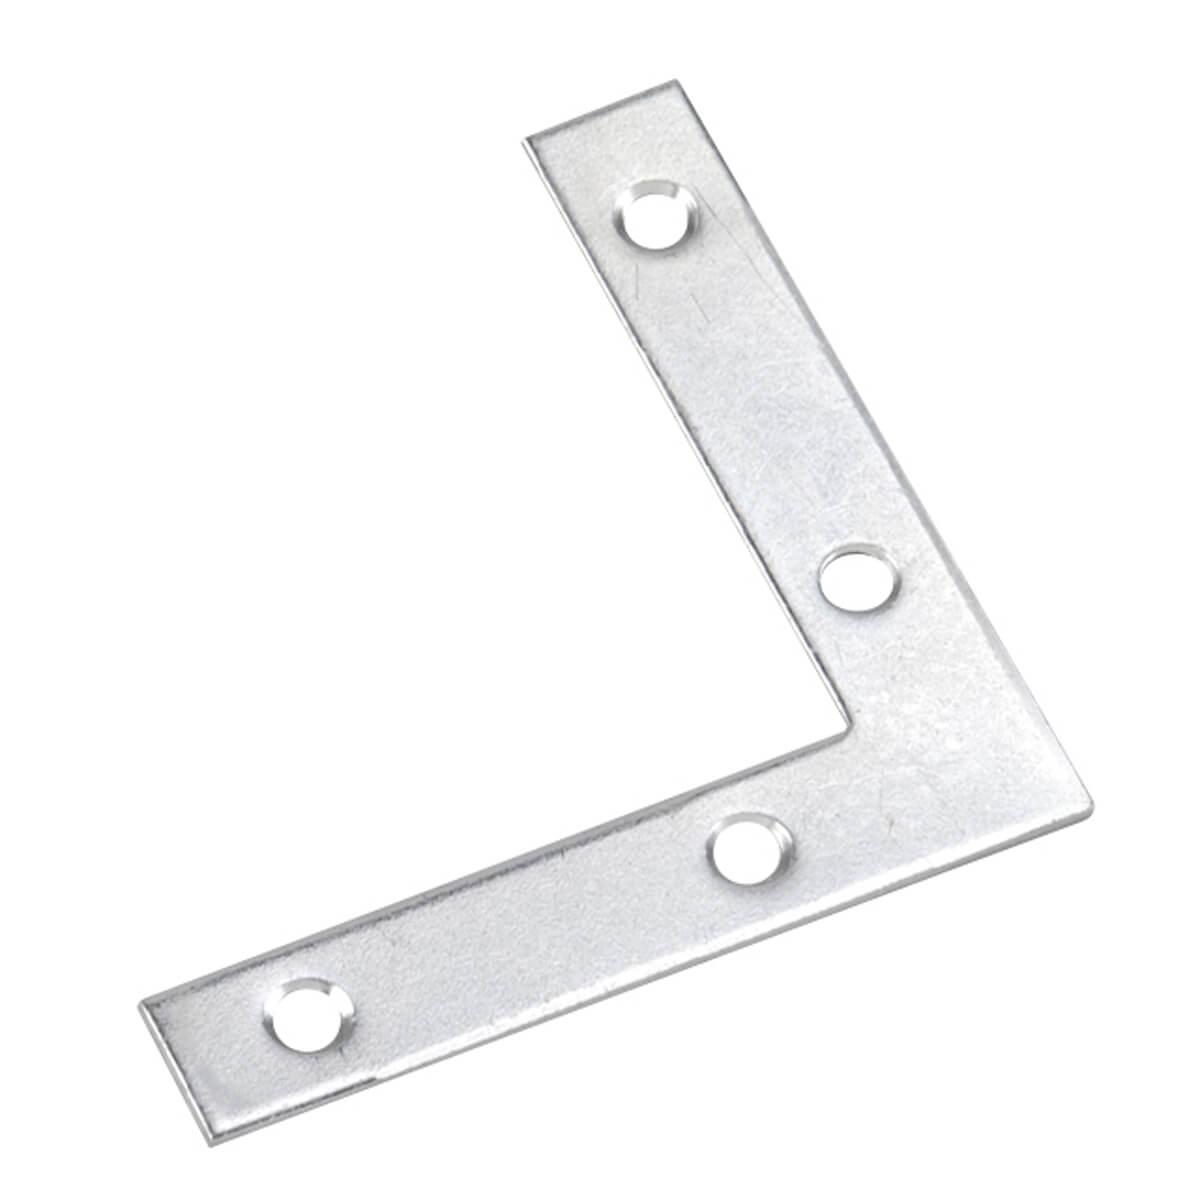 "Flat Corner Brace - 4"" x 3/4"""